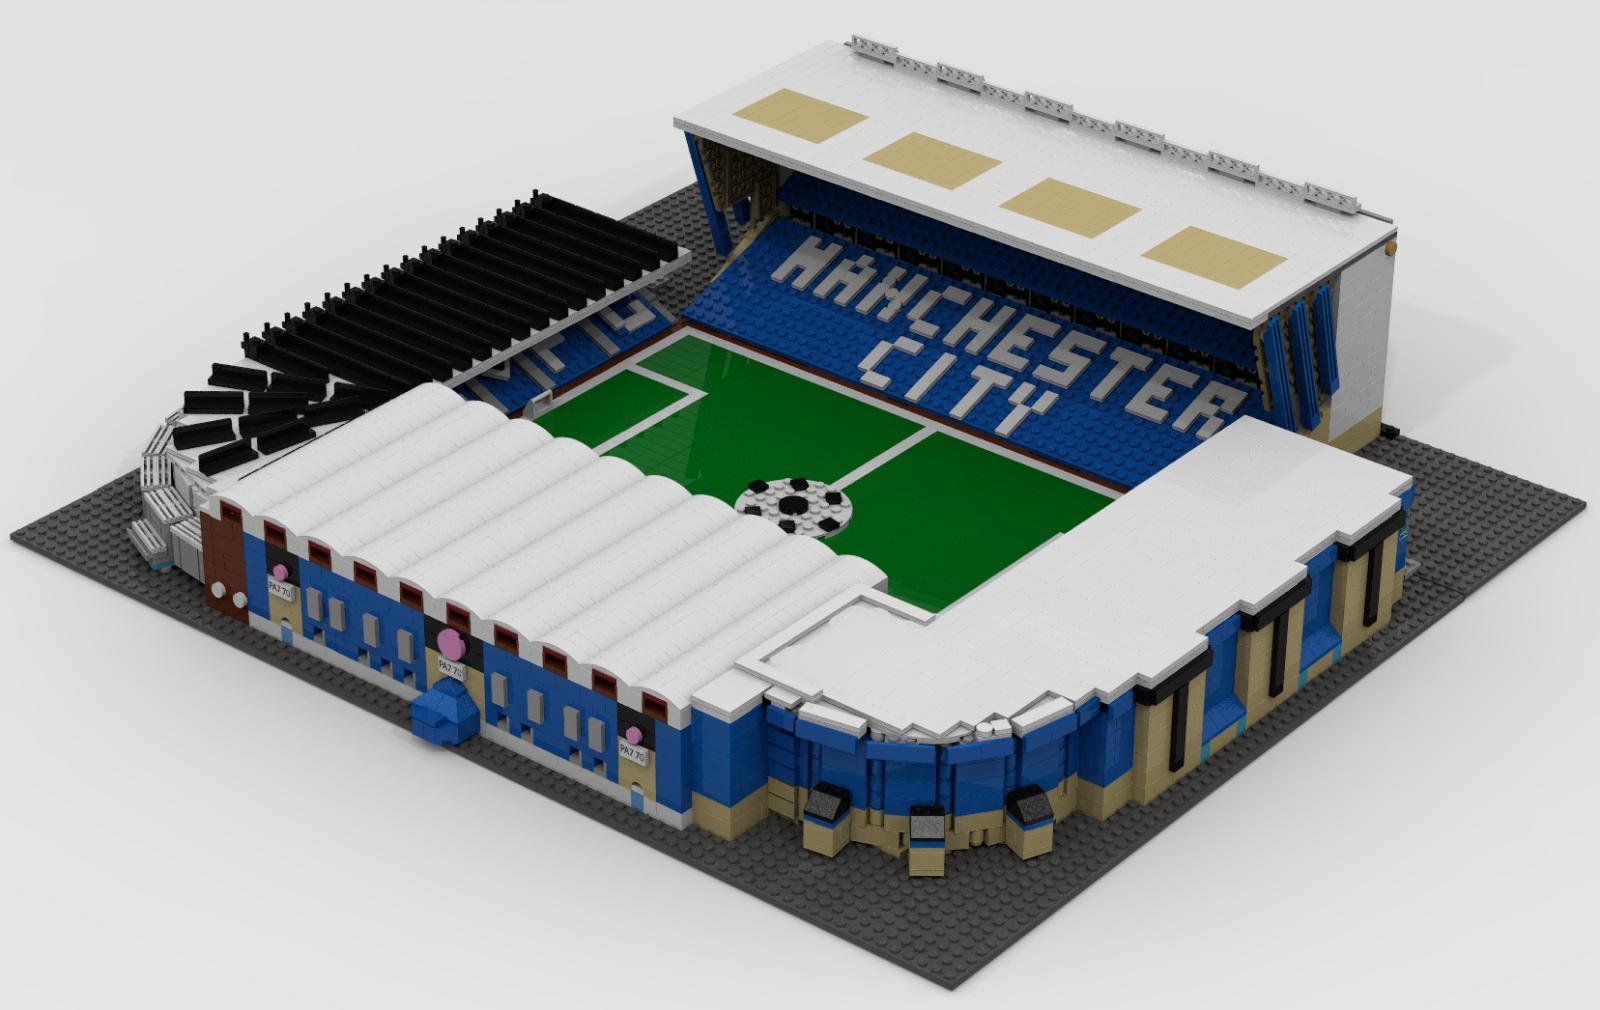 CUSTOM CUSTOM CUSTOM LEGO BUILDING. Maine Road Stadium. Manchester City Football Club. Premier 1c4735